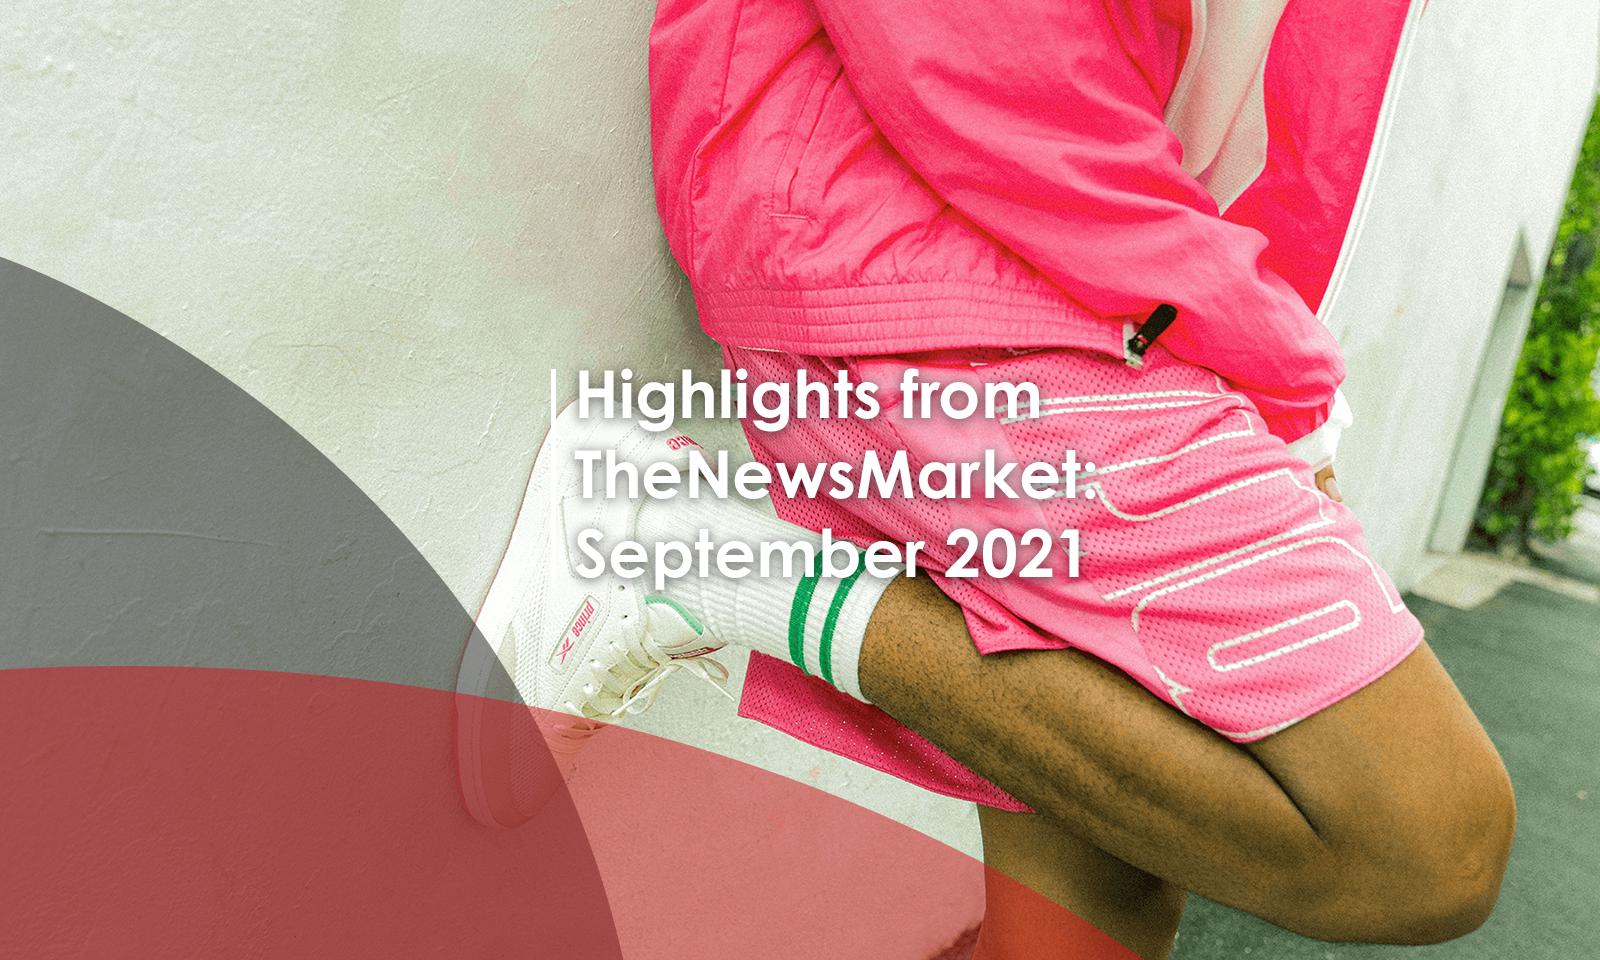 Highlights from TheNewsMarket: September 2021